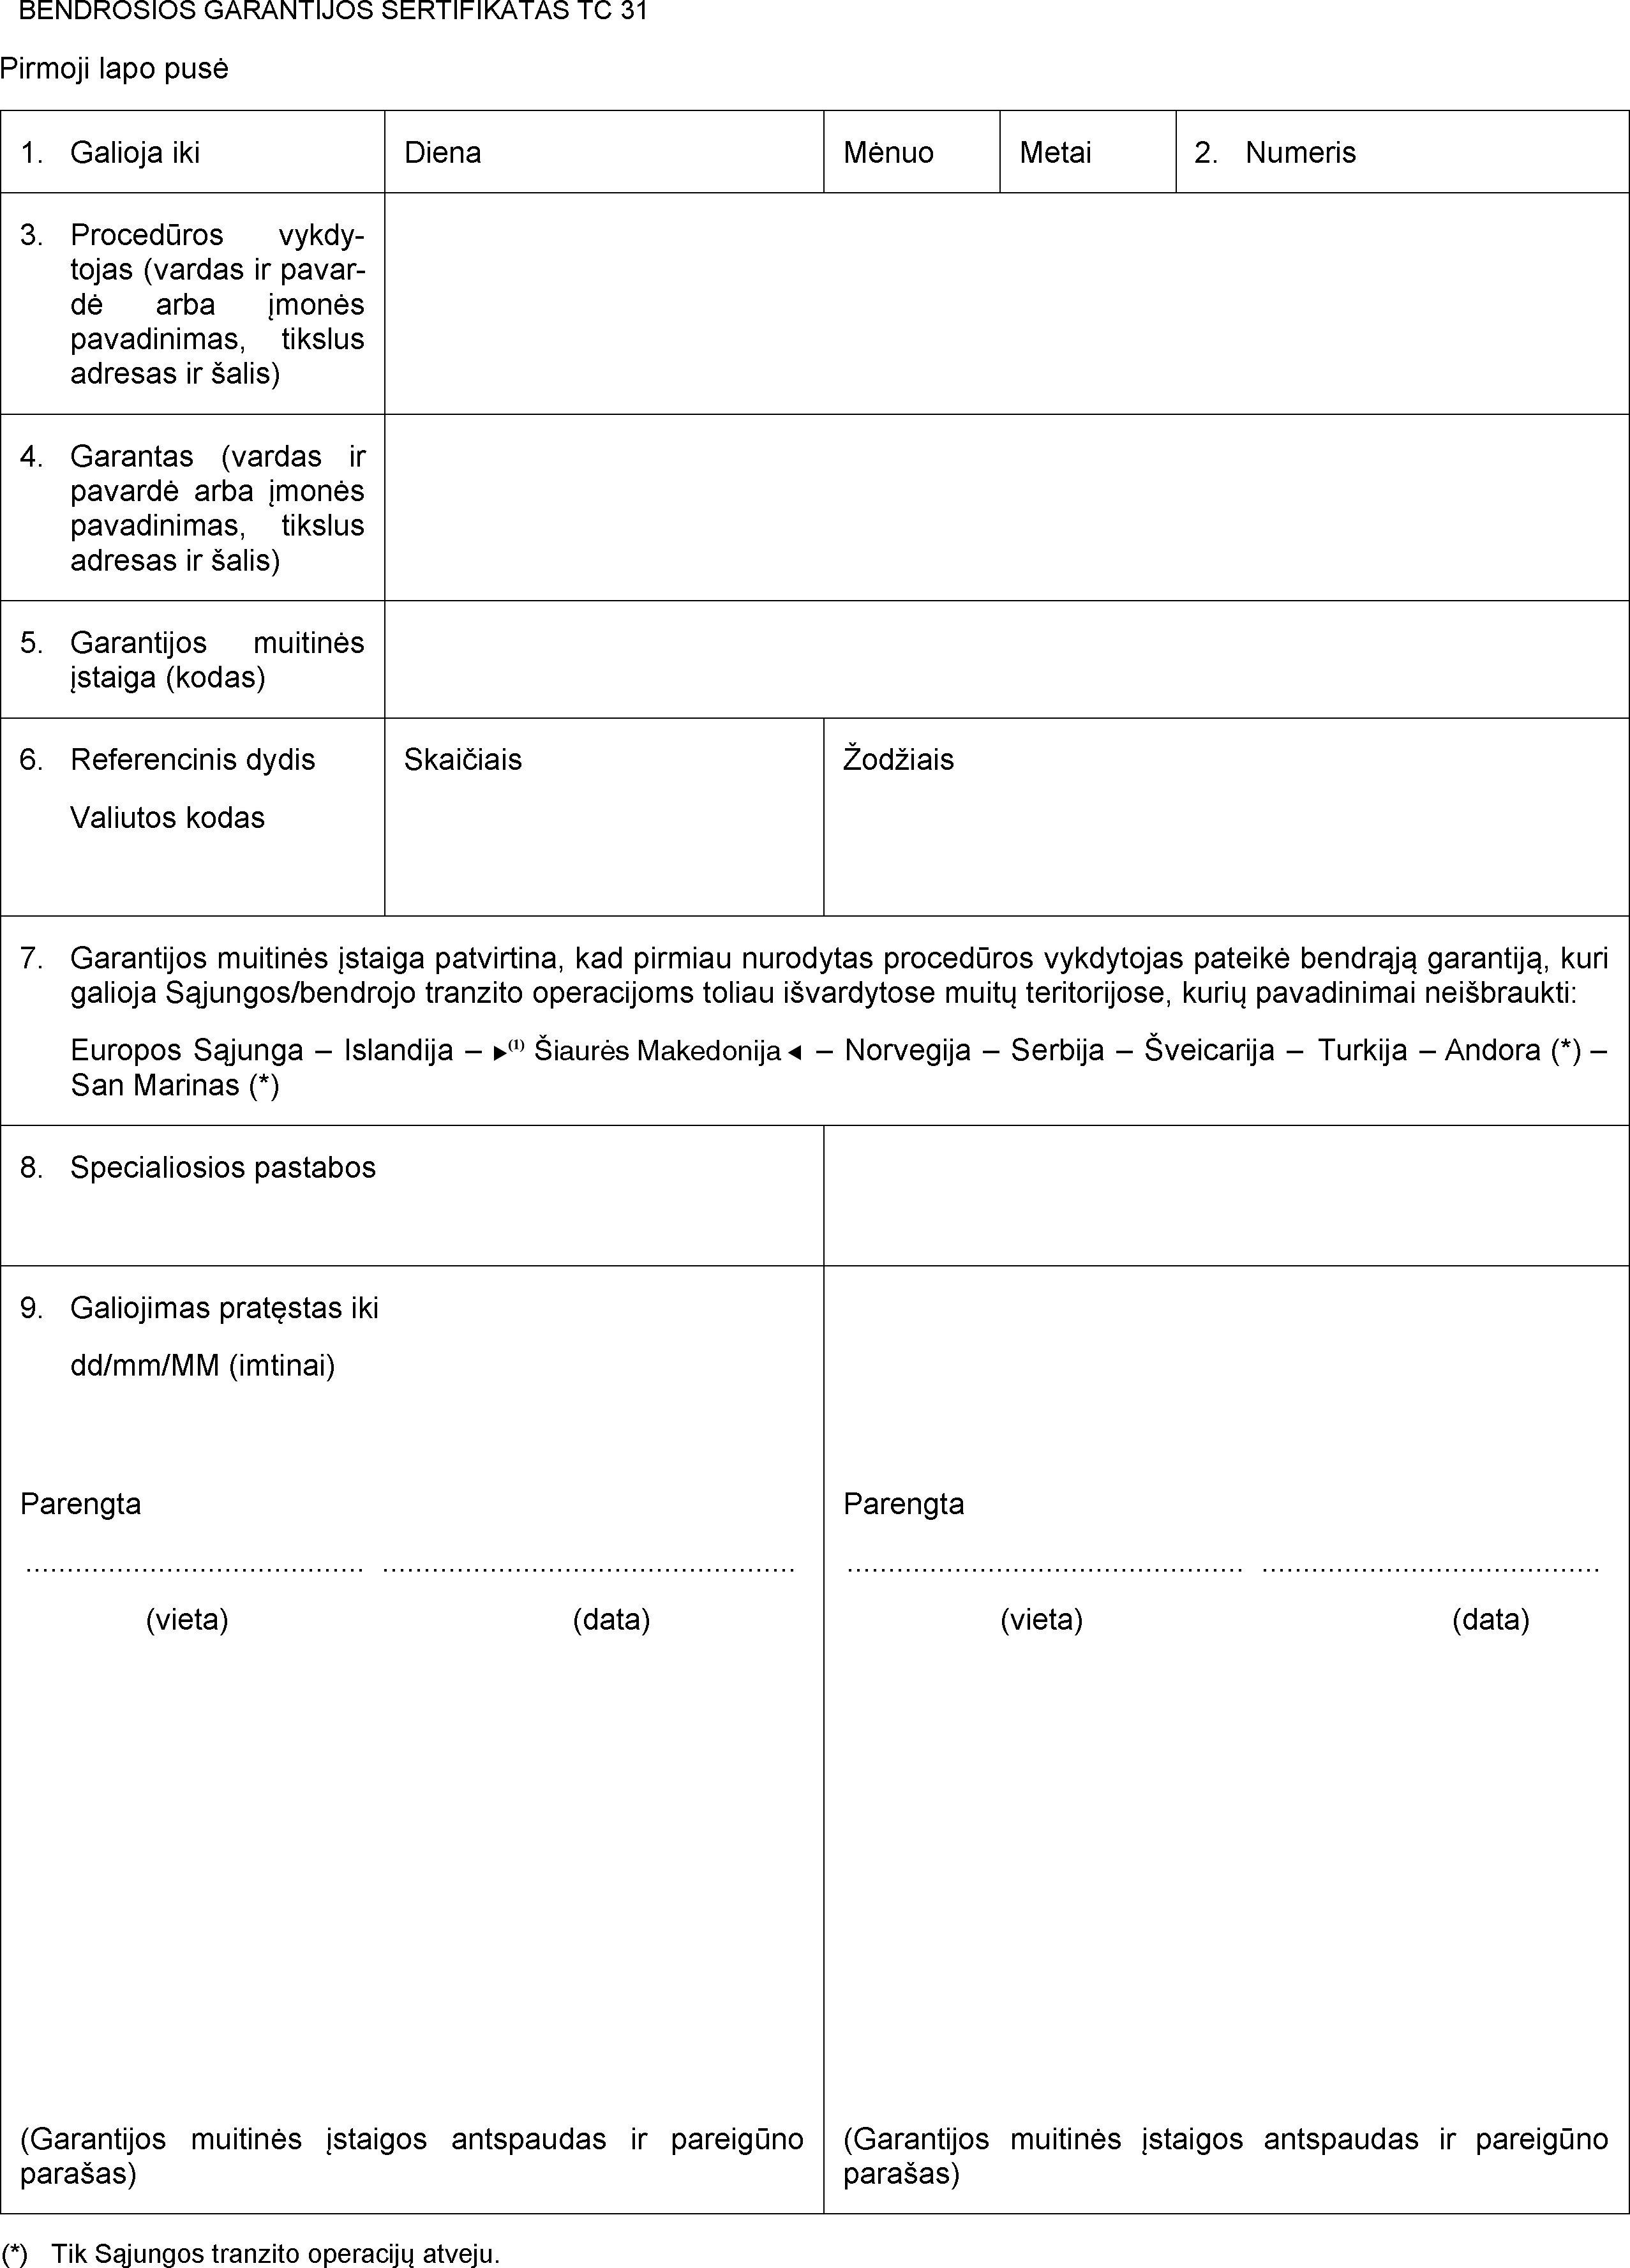 Alpari forex prekybos apžvalga - archviz.lt